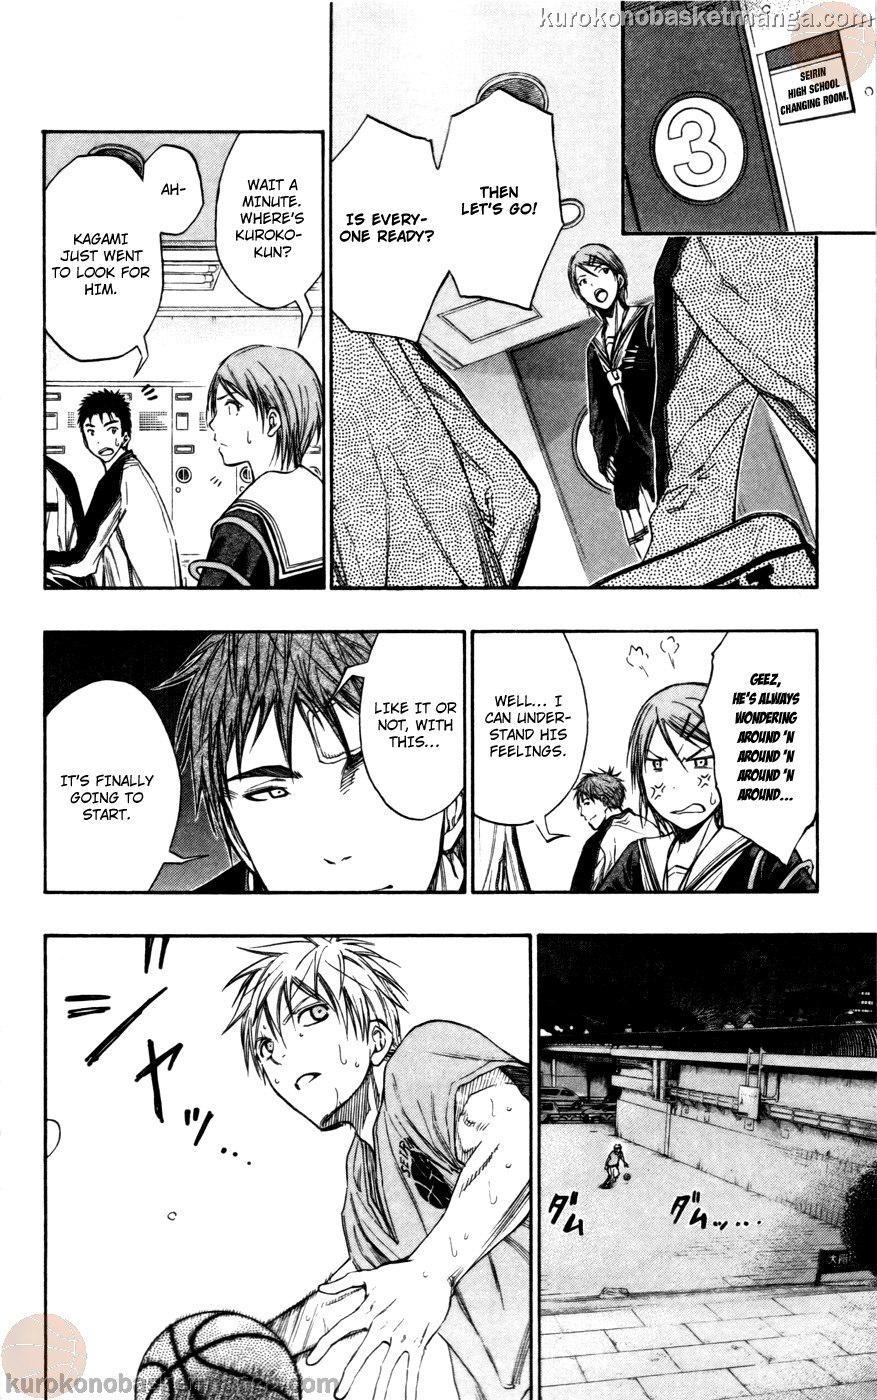 Kuroko no Basket Manga Chapter 108 - Image 12